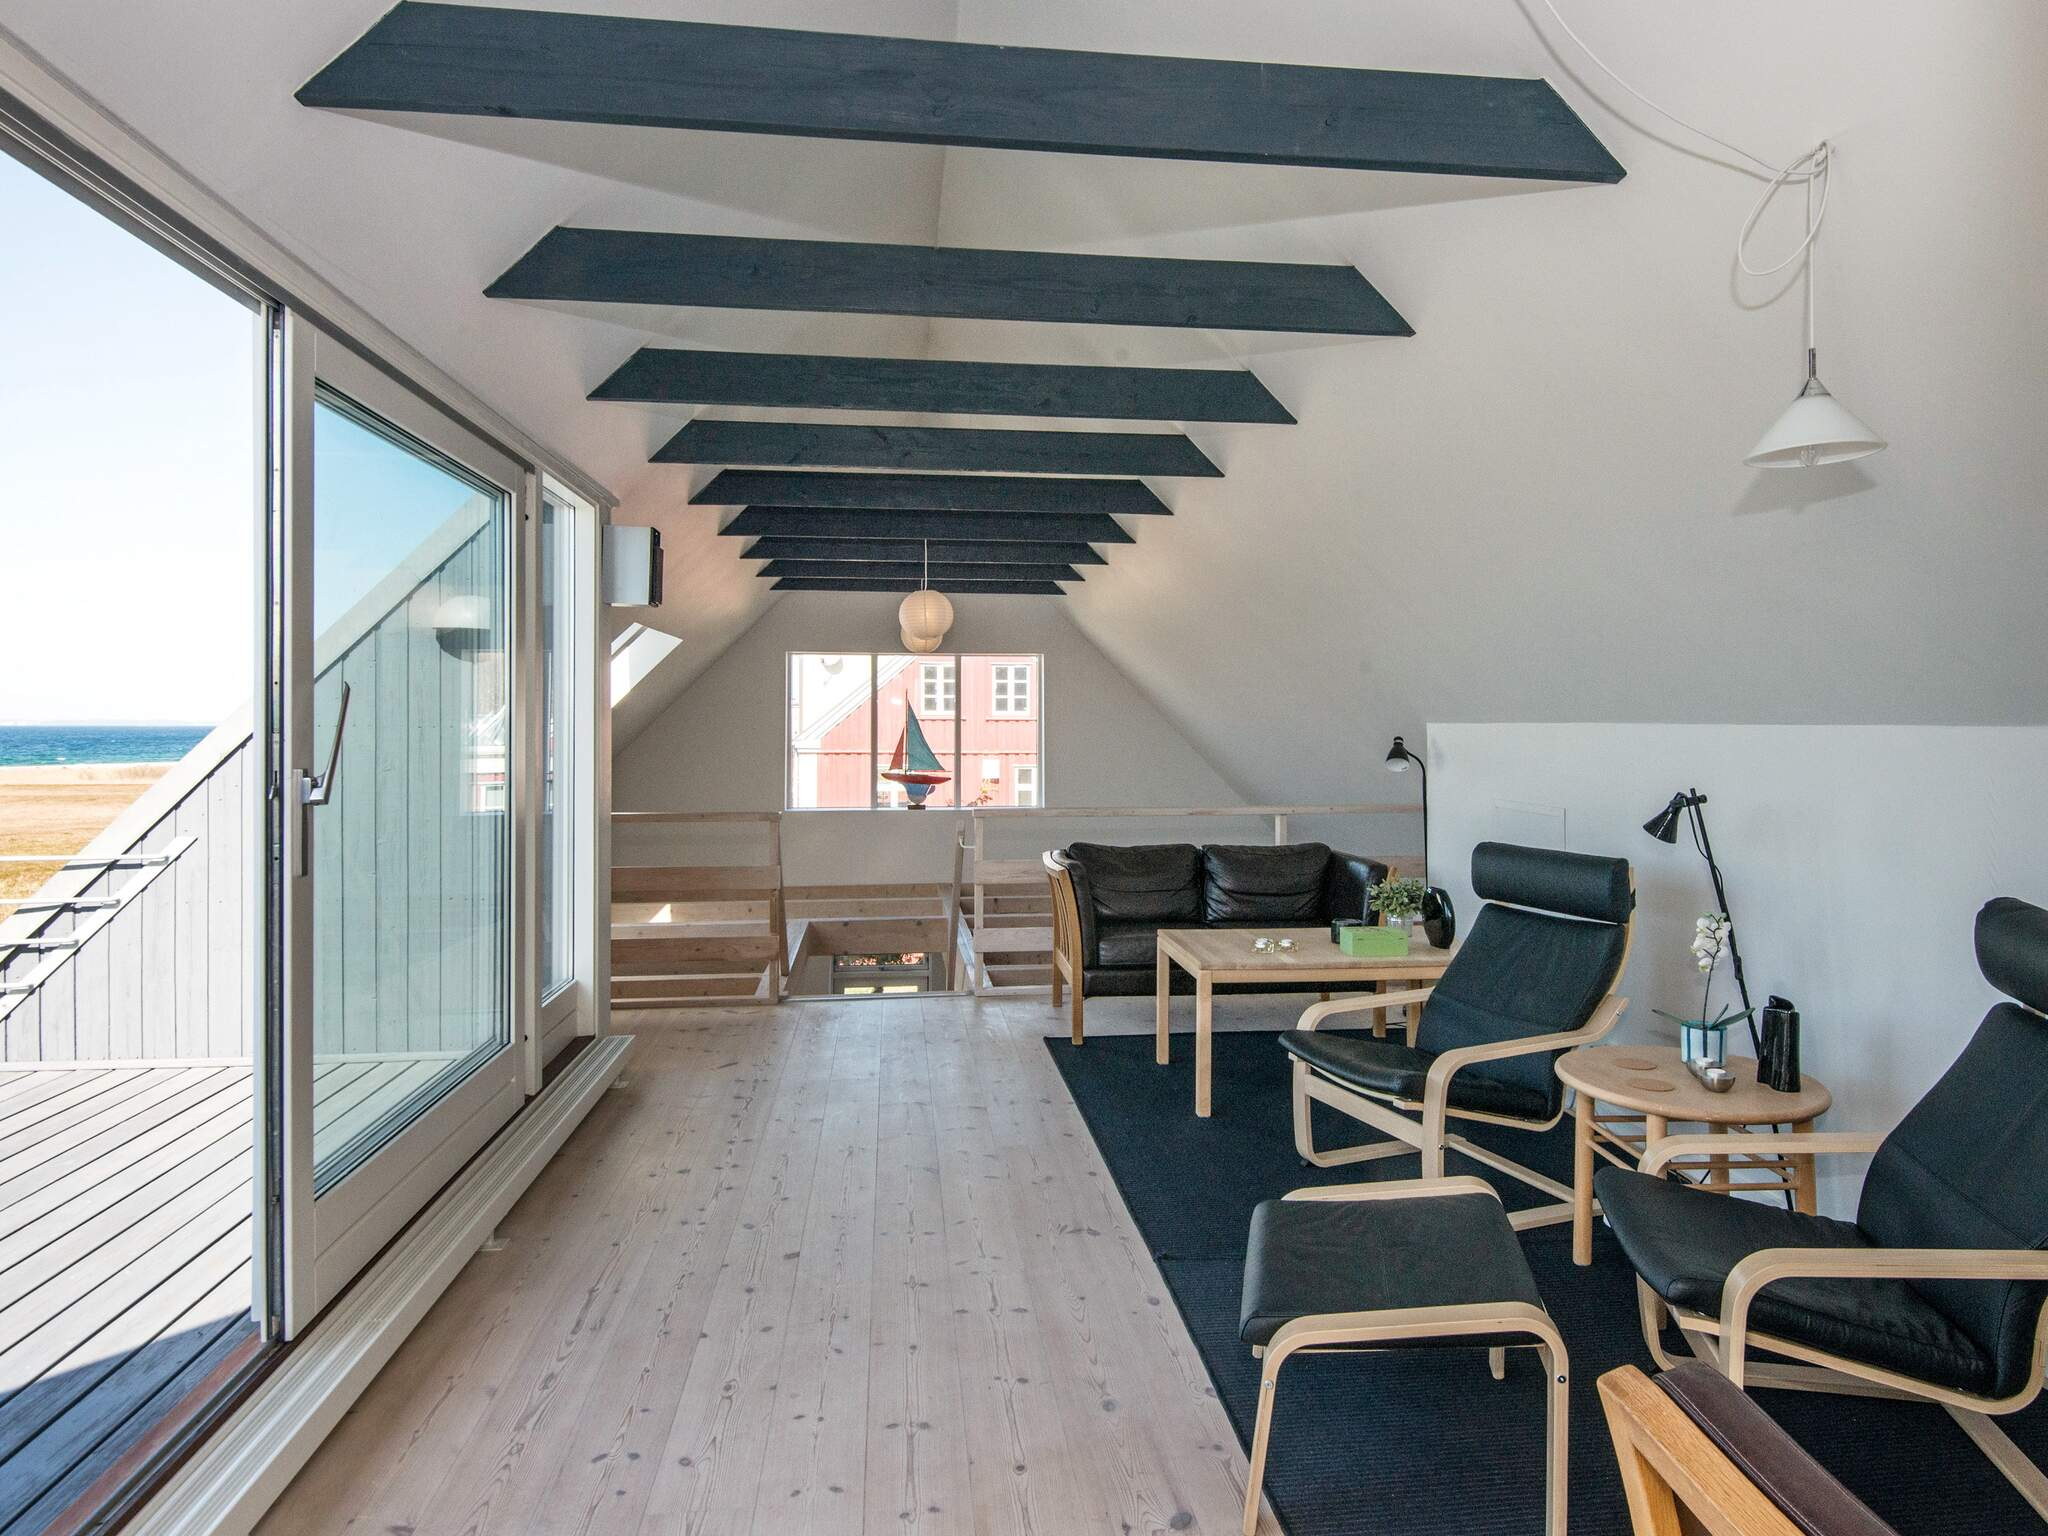 Maison de vacances Helgenæs (590964), Knebel, , Mer Baltique danoise, Danemark, image 4